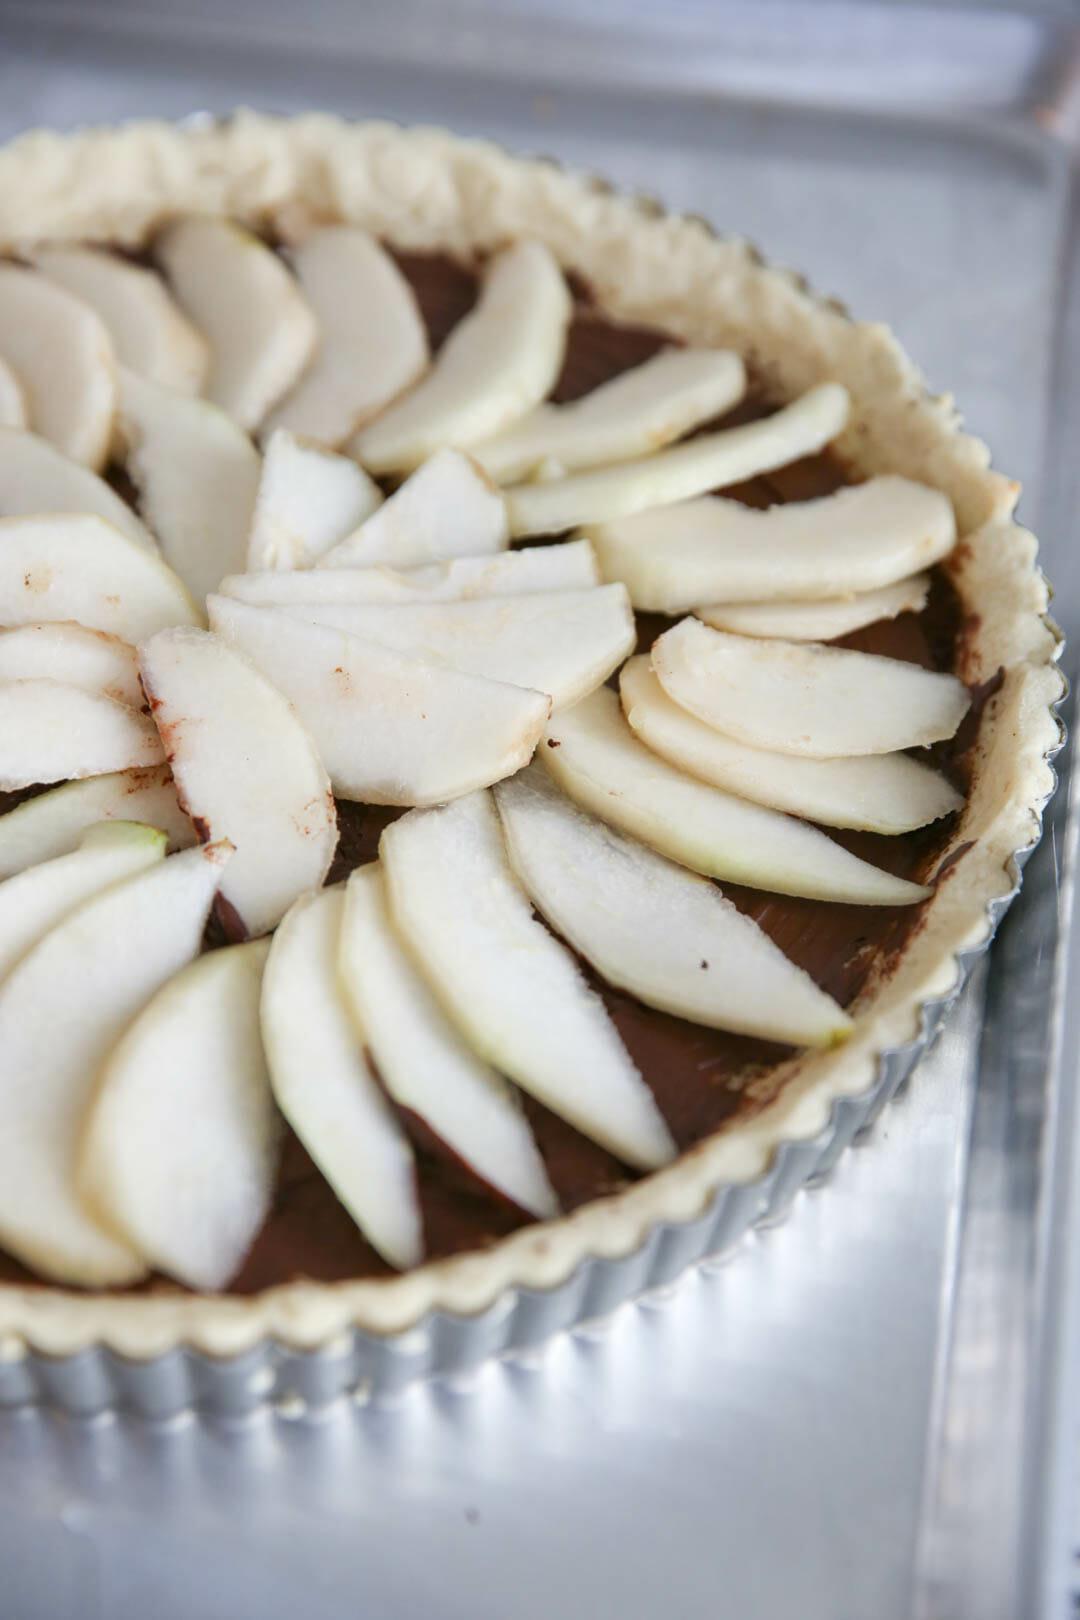 The best Holiday Dessert Recipes: Chocolate Pear Tart